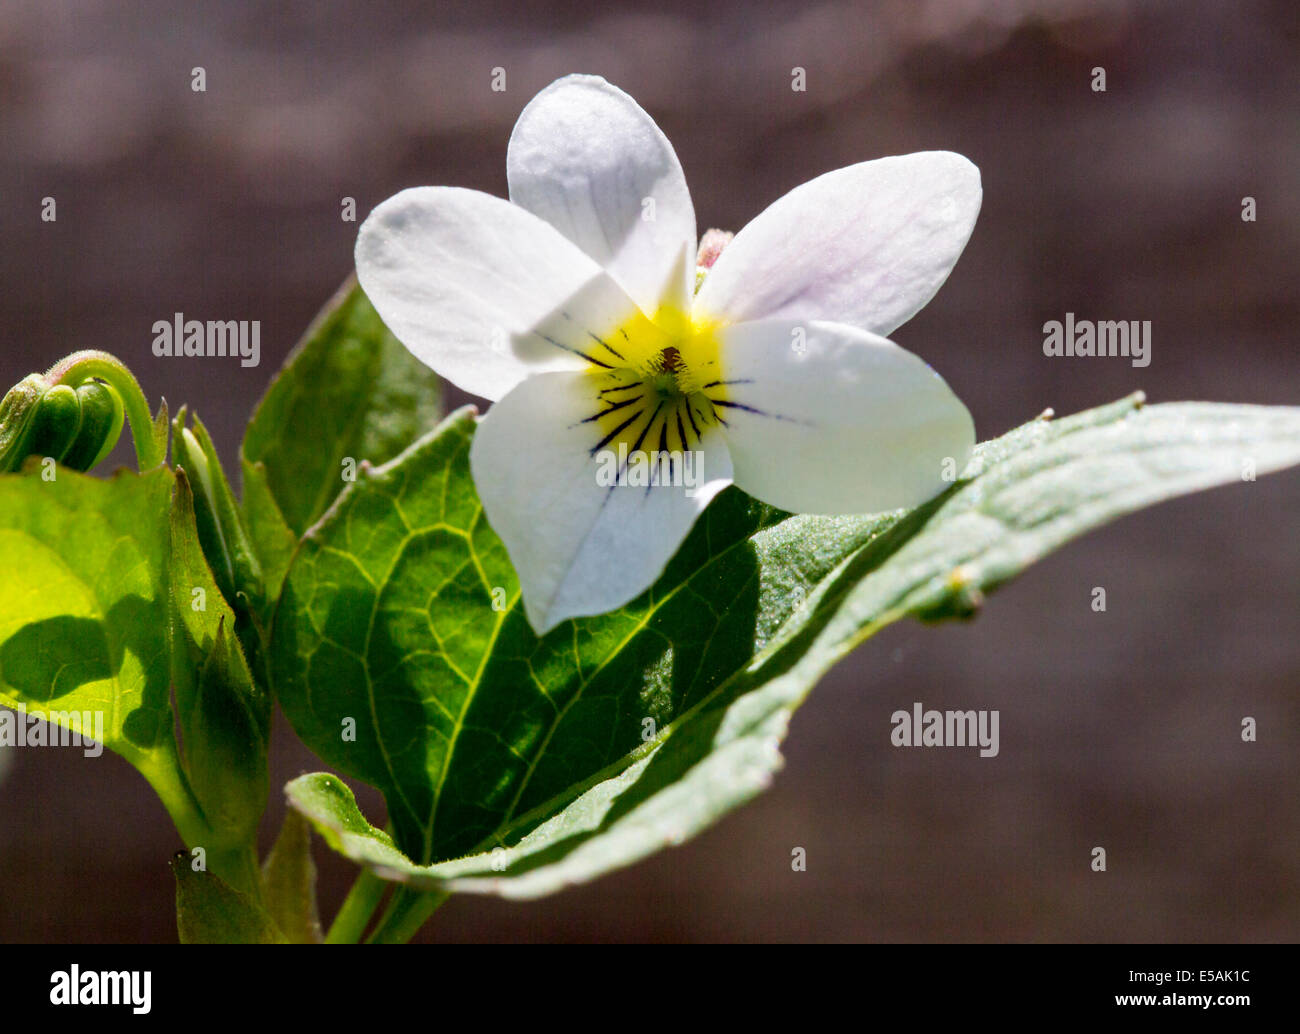 Viola canadensis; scopulorum; Viola scopulorum; White Violet; Violaceae; Violet Family; wildflowers in bloom, Central - Stock Image